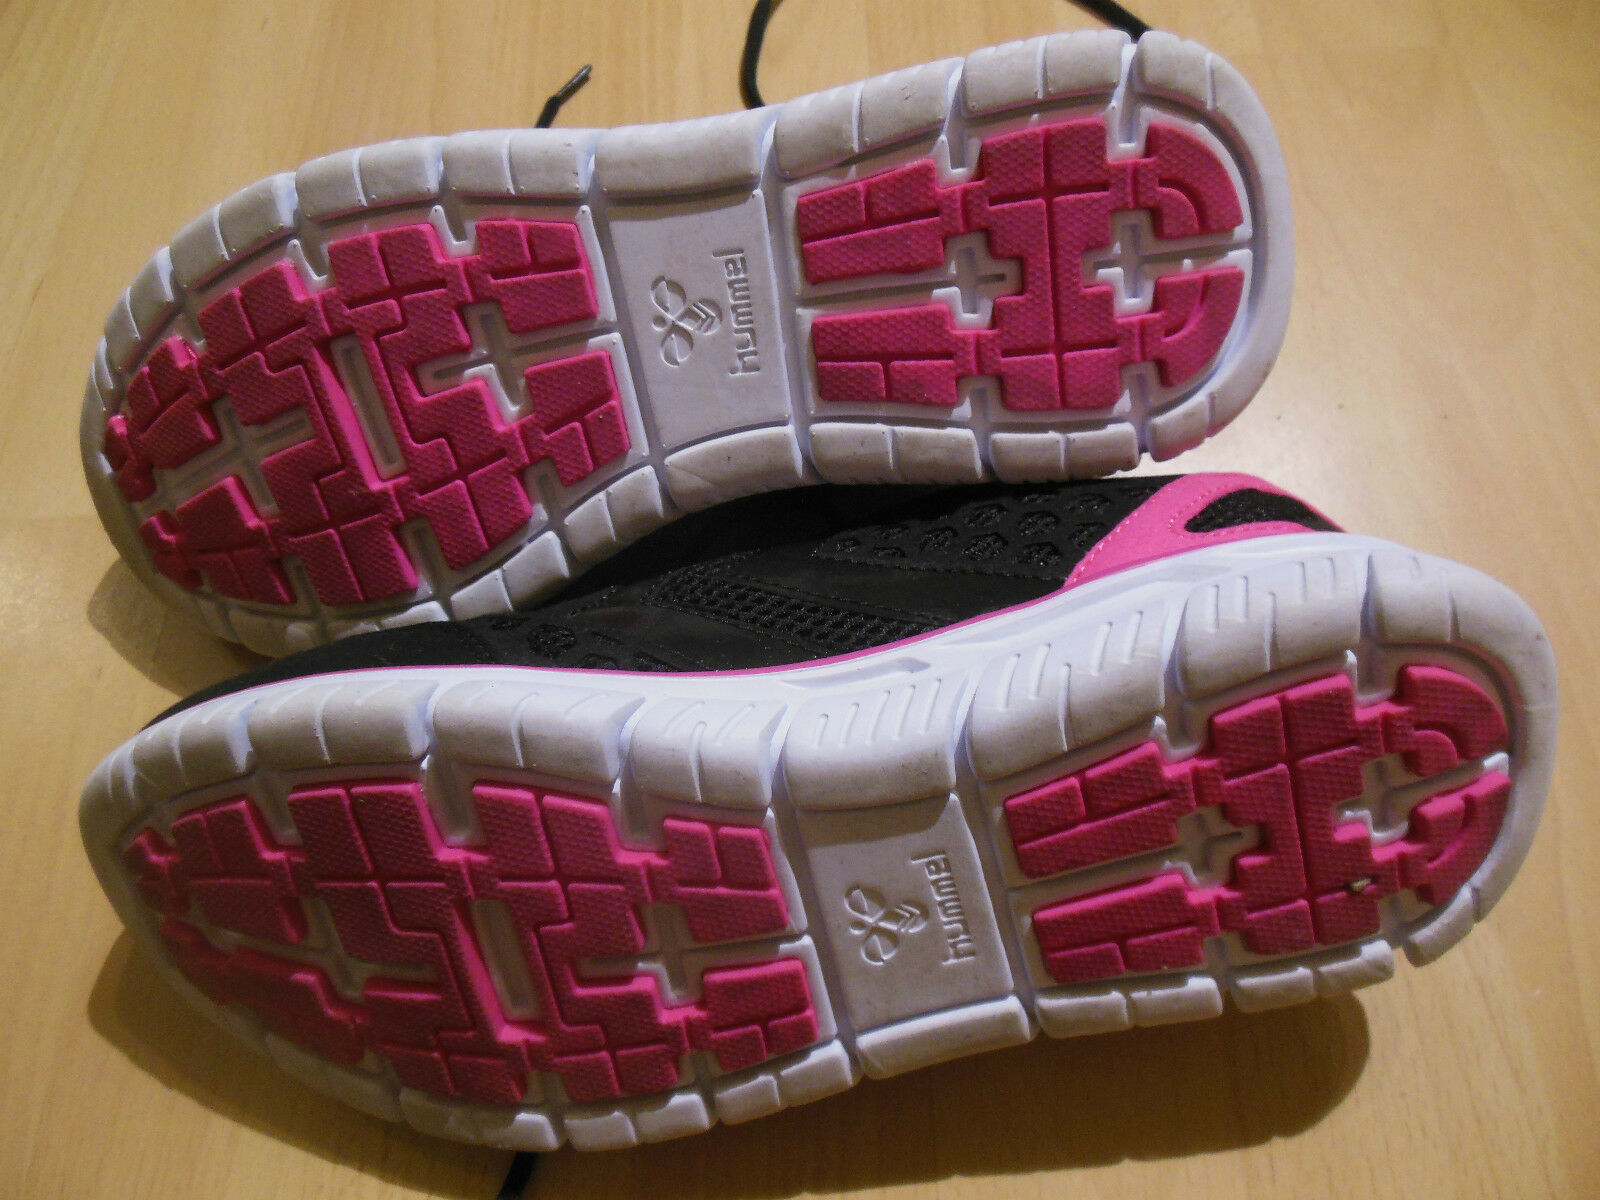 Super schöne Sneaker Damen Hummel Sneaker schöne Gr.41 9a49a4